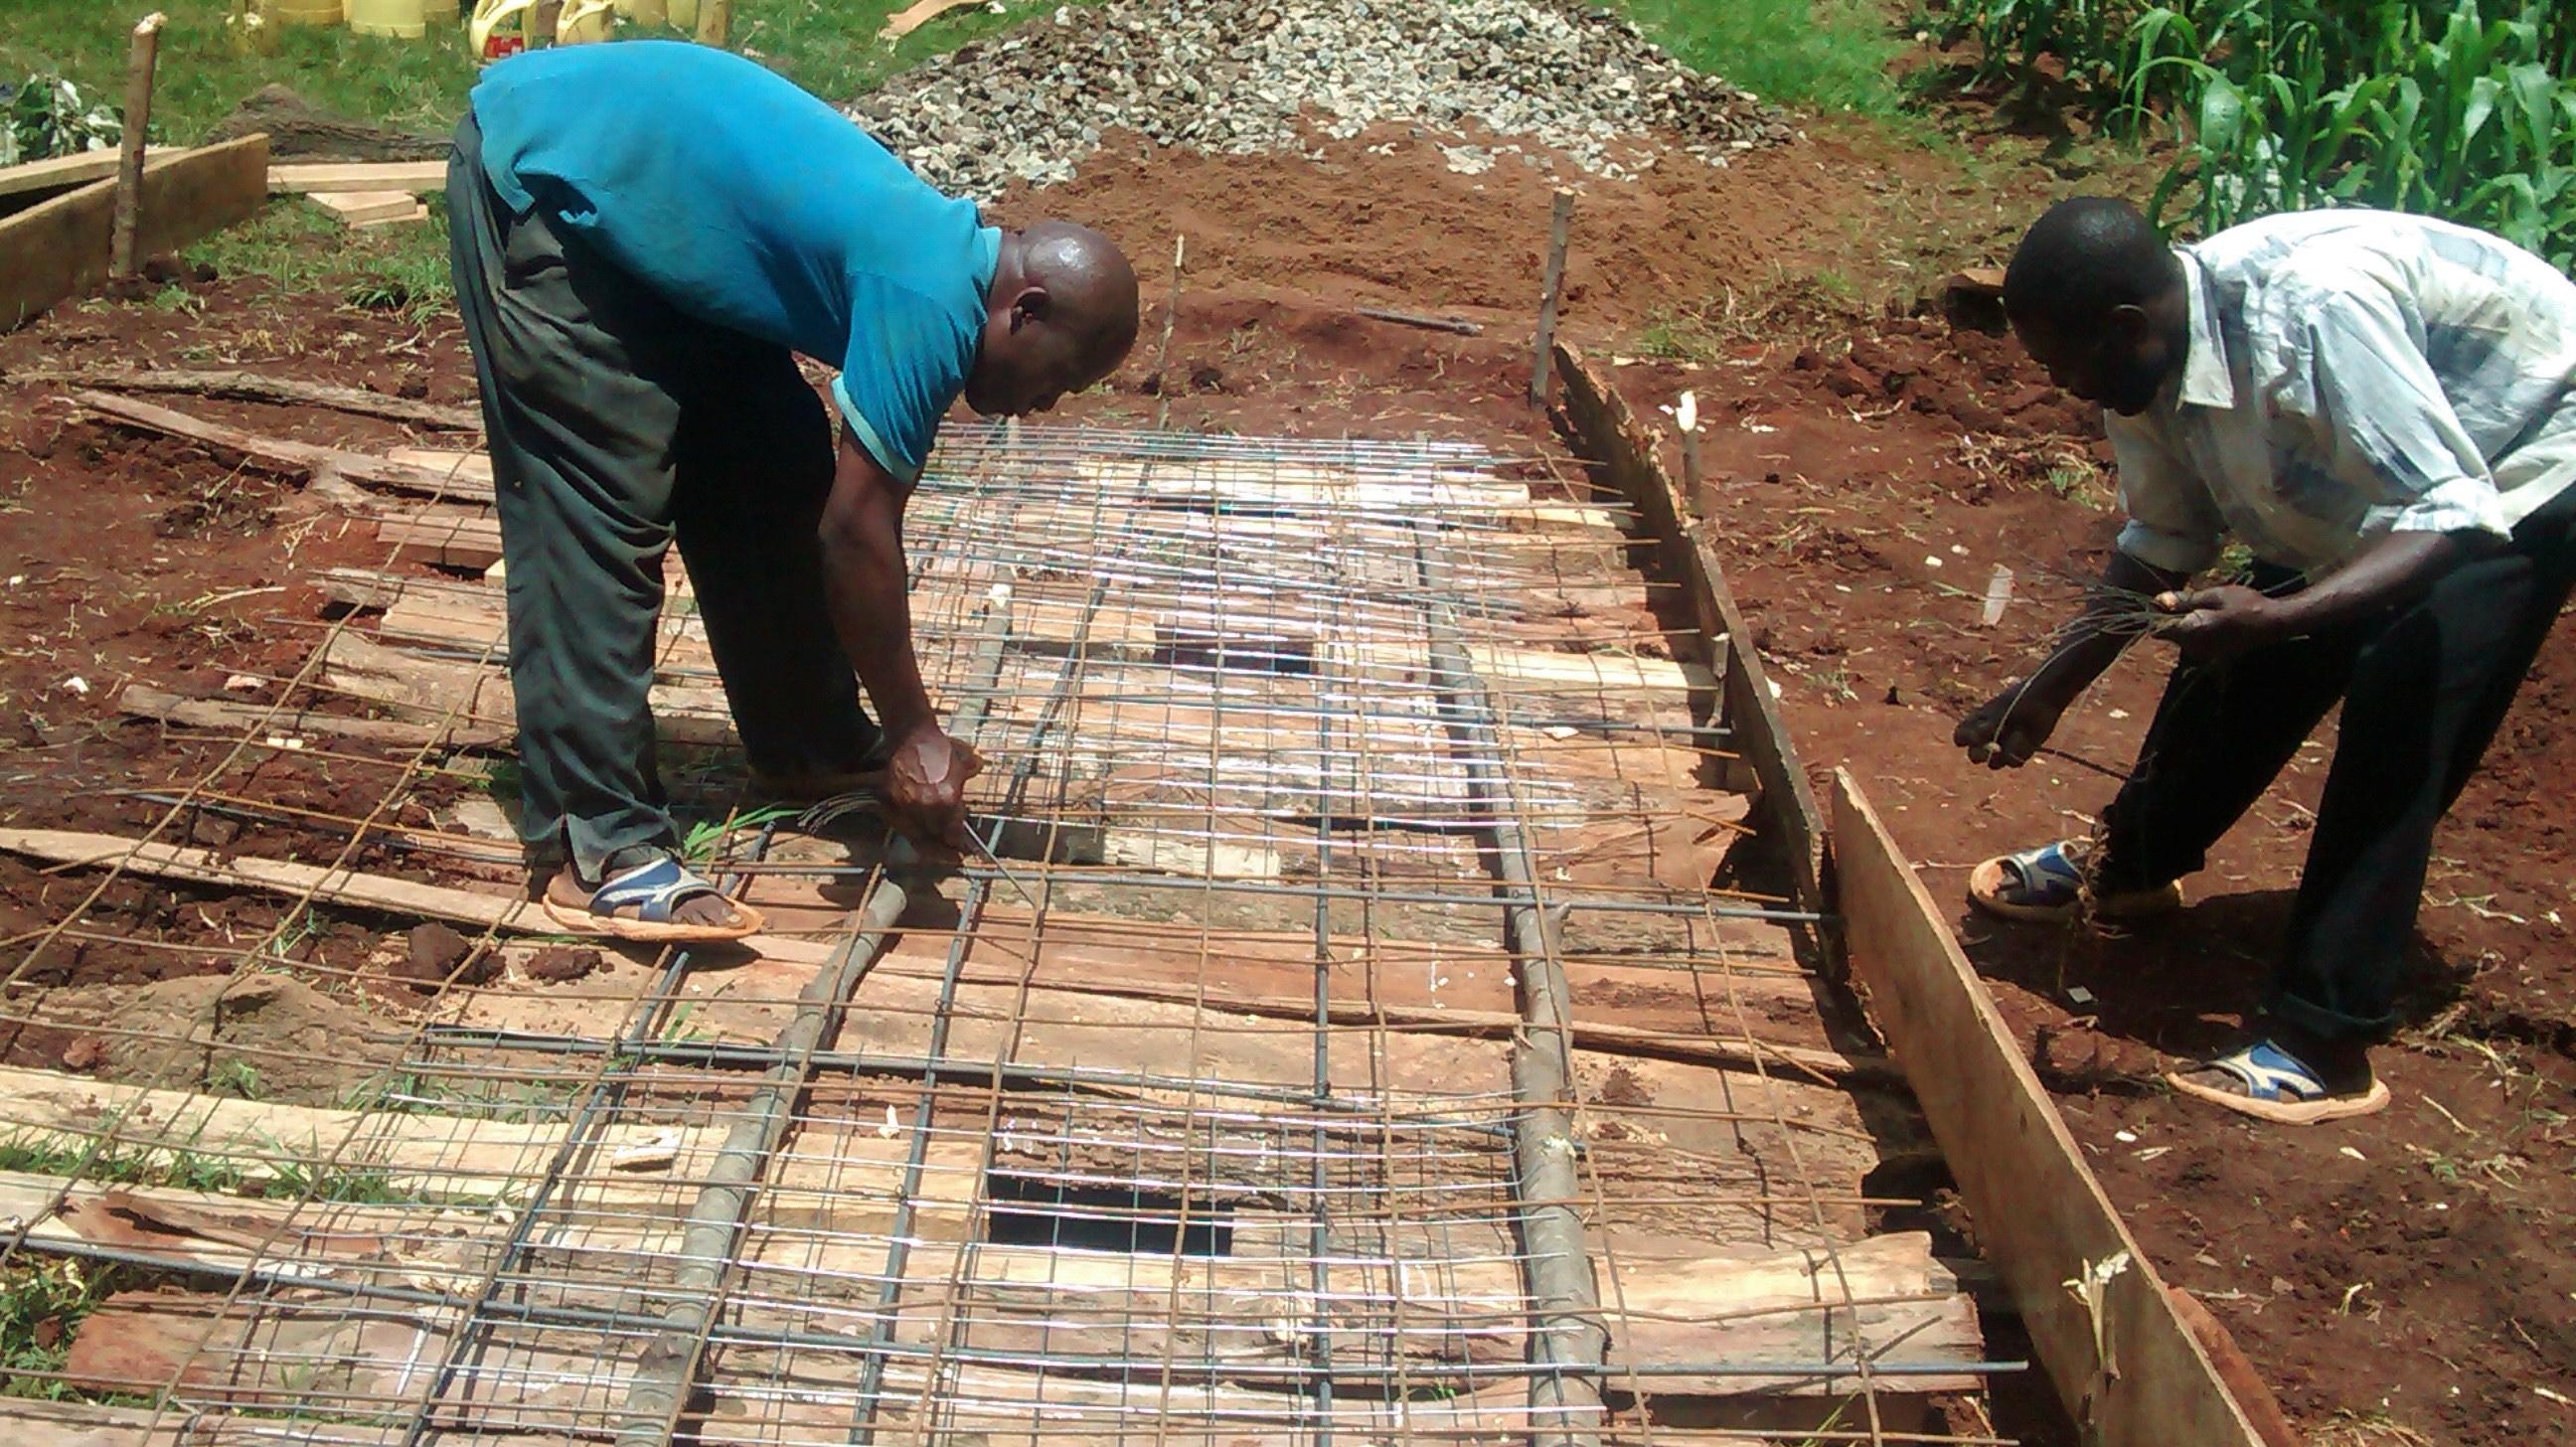 The Water Project Kenya Ebusiloli Primary School